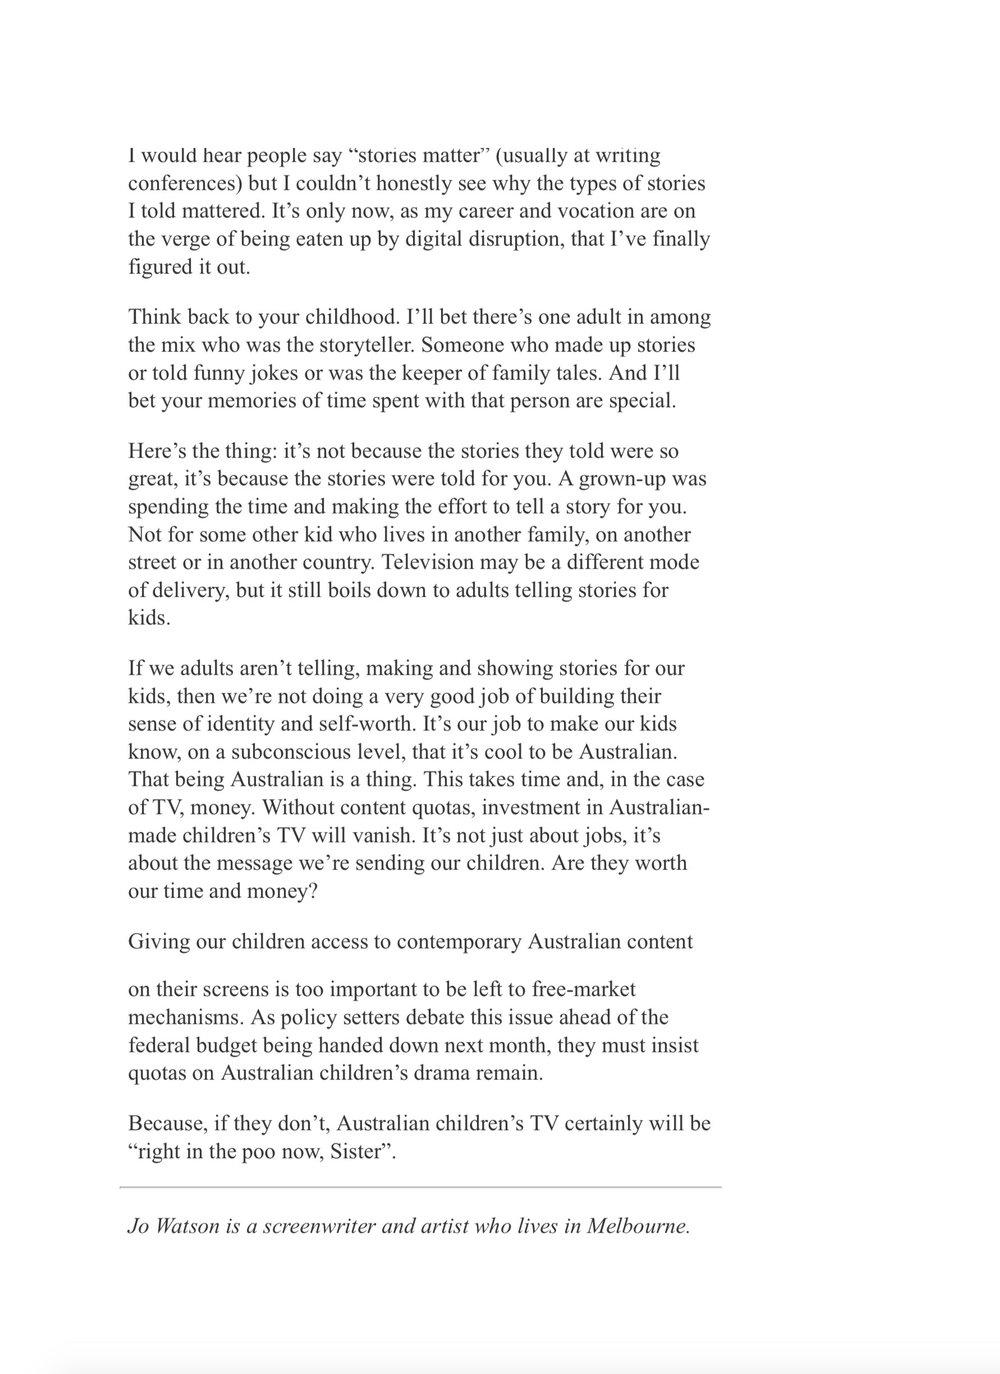 Australian_feature_article_Kids_TV_5